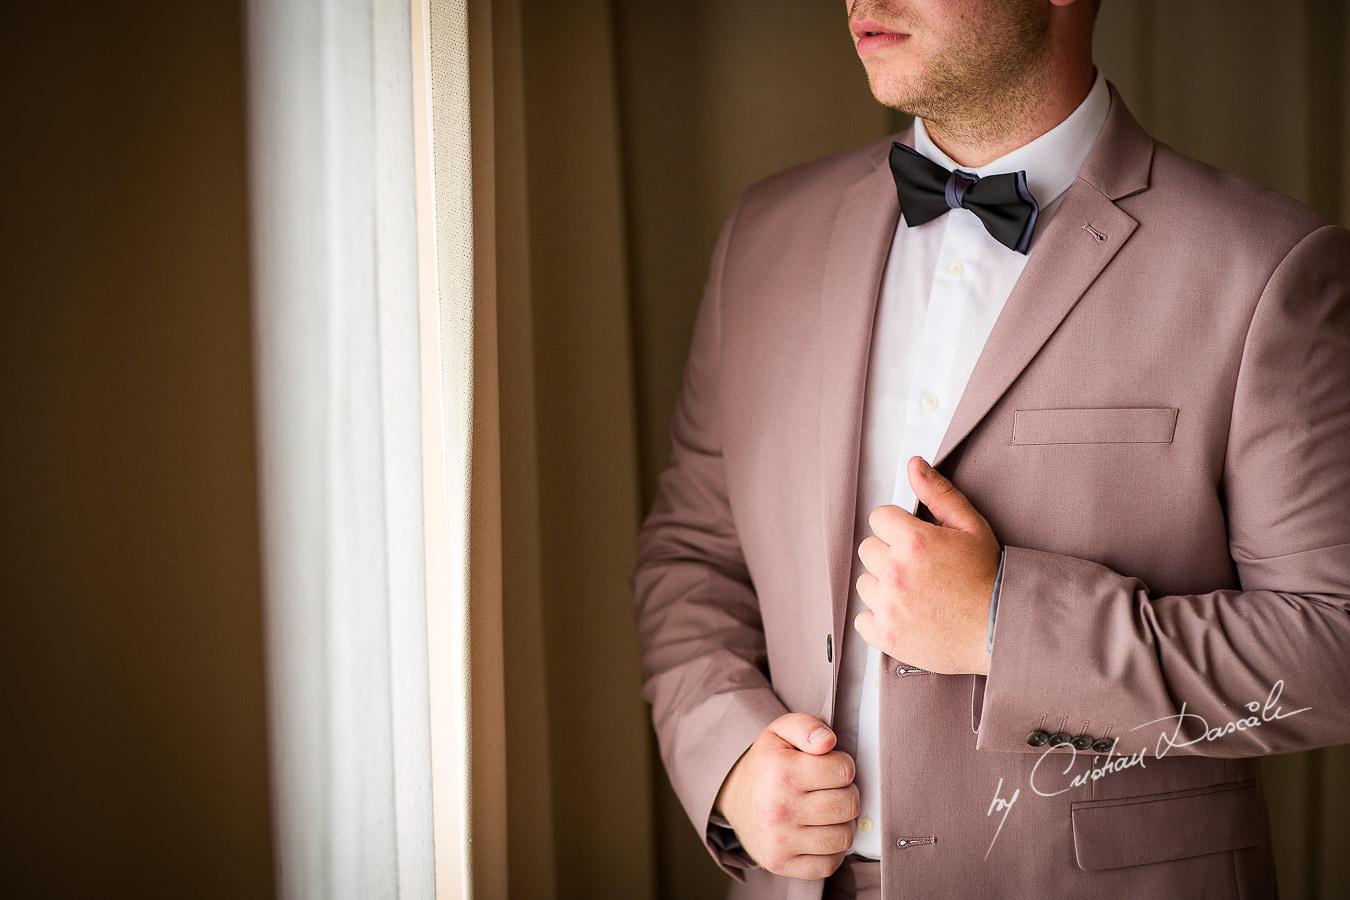 Groom portraiture at a Beautiful Wedding at Elias Beach Hotel captured by Cyprus Photographer Cristian Dascalu.